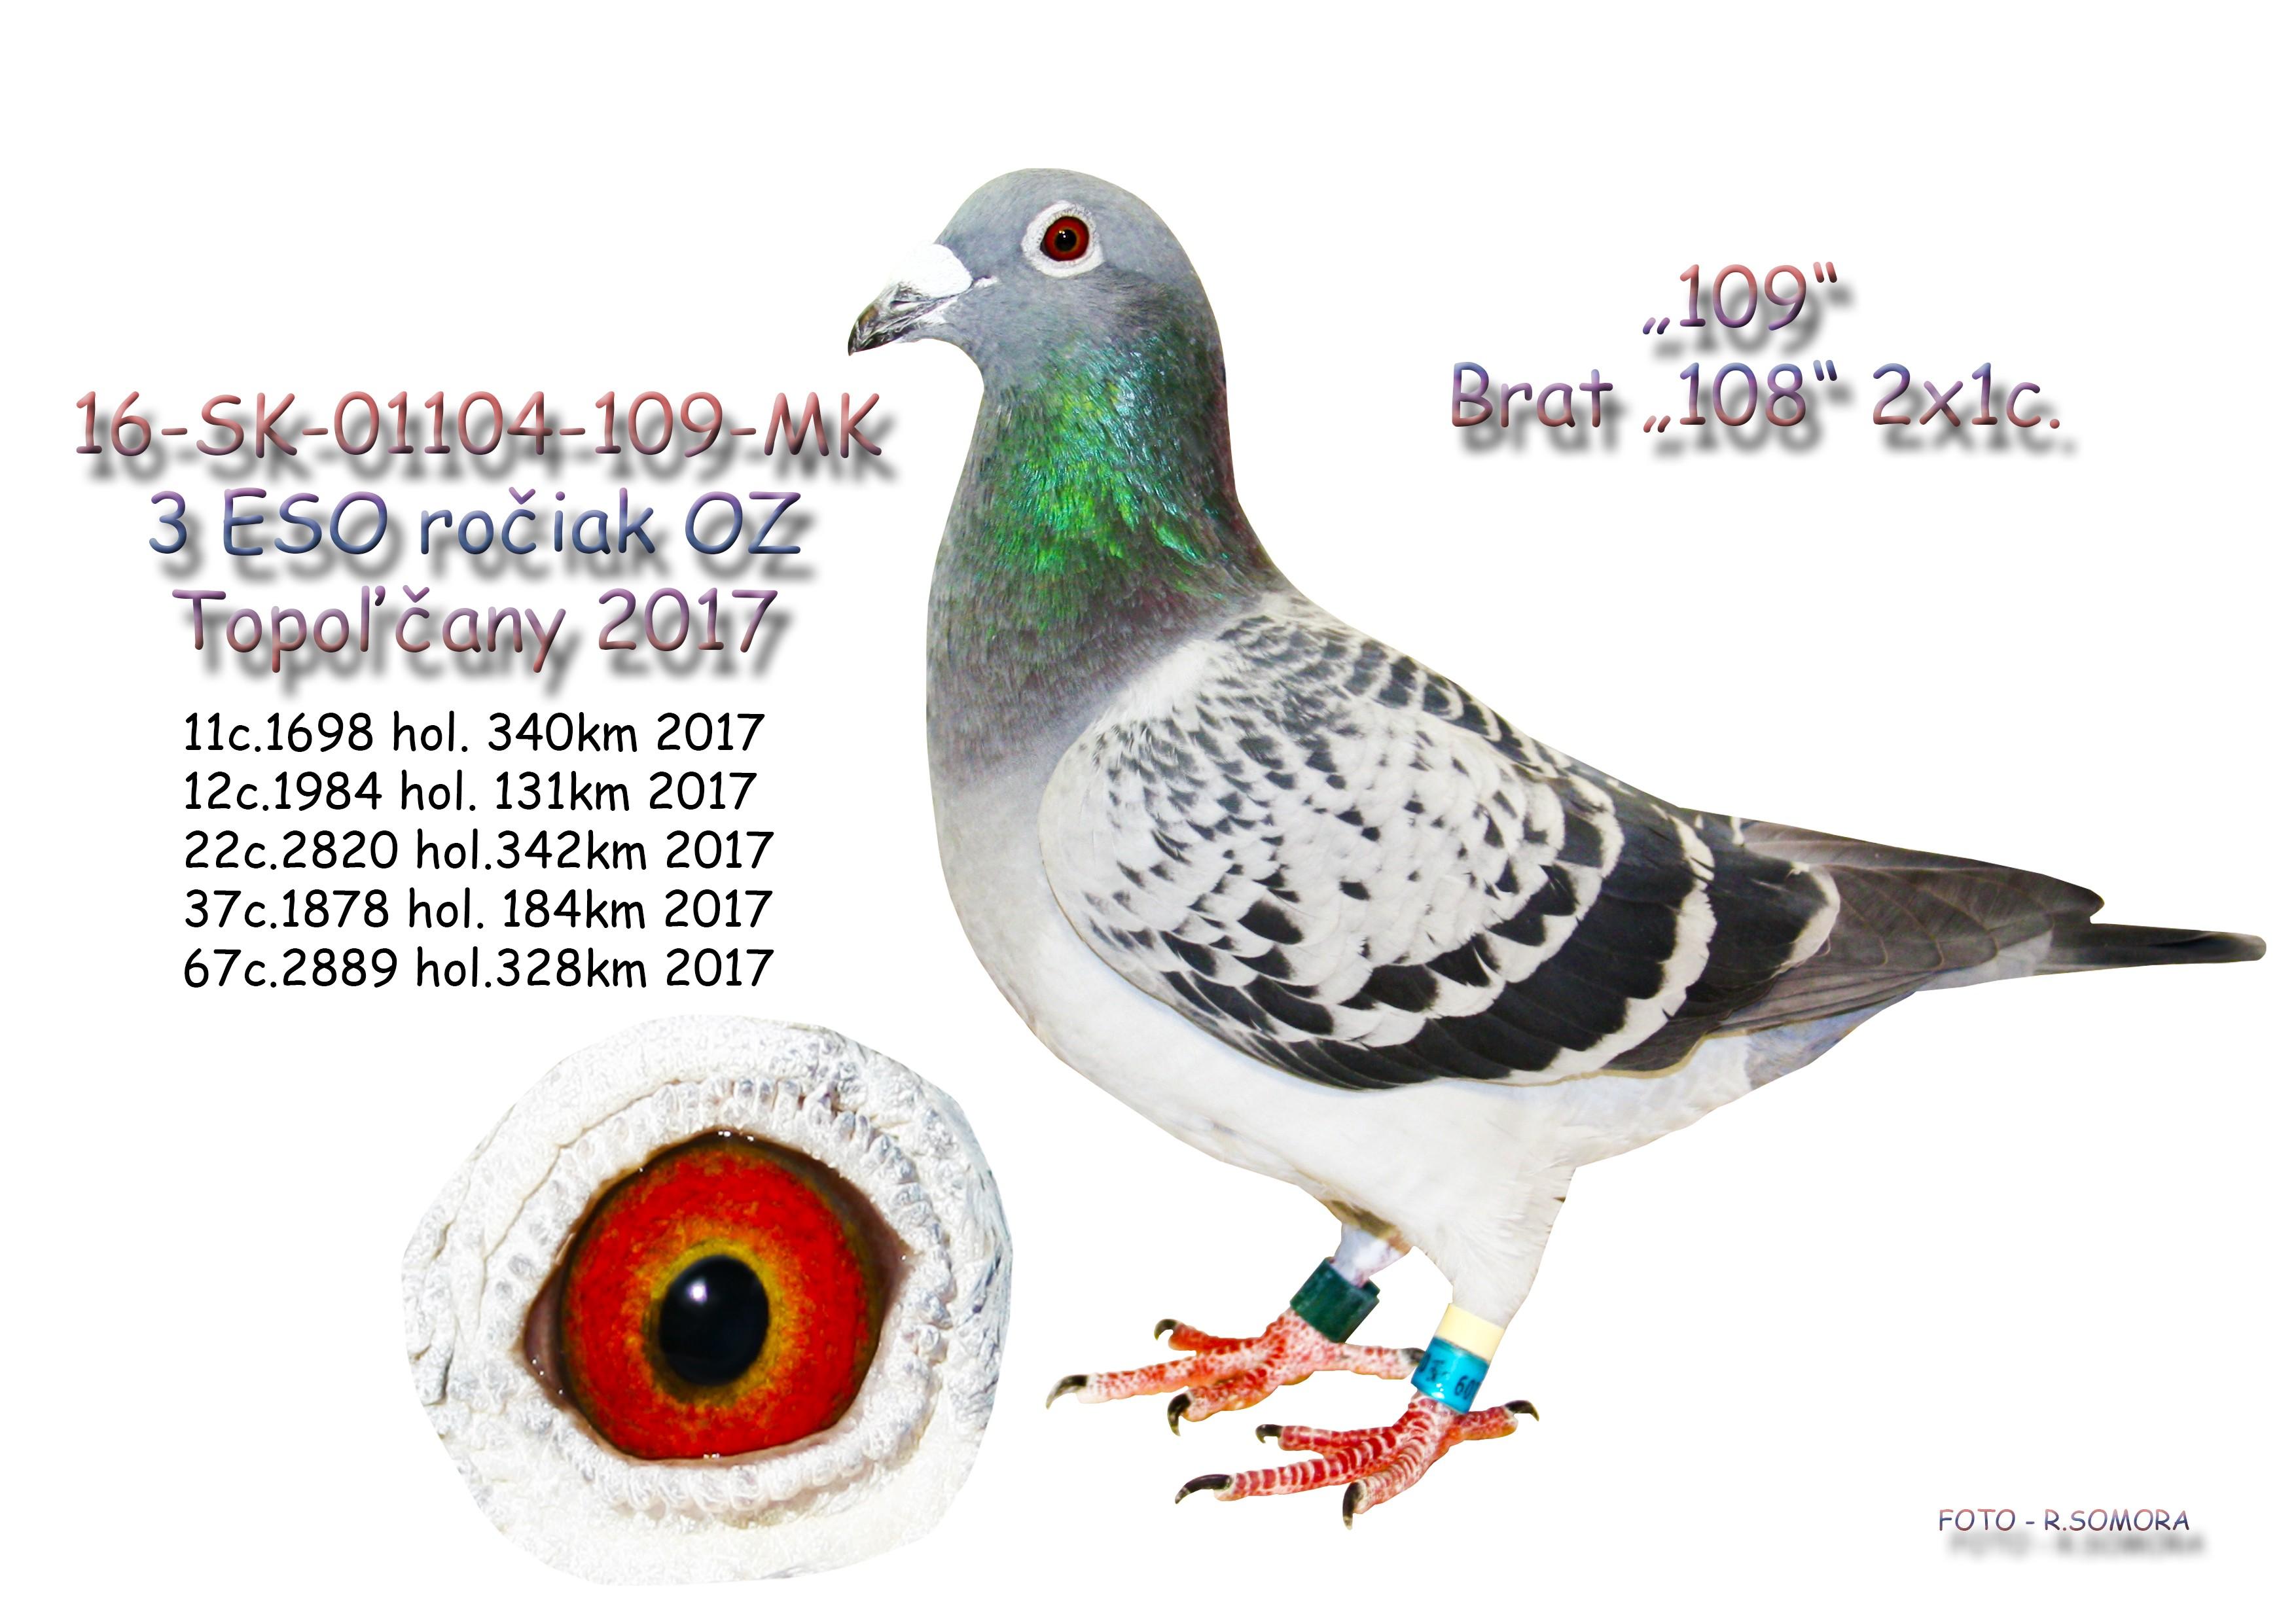 SK-2016-01104-109 - Somora Jozef+Rudolf